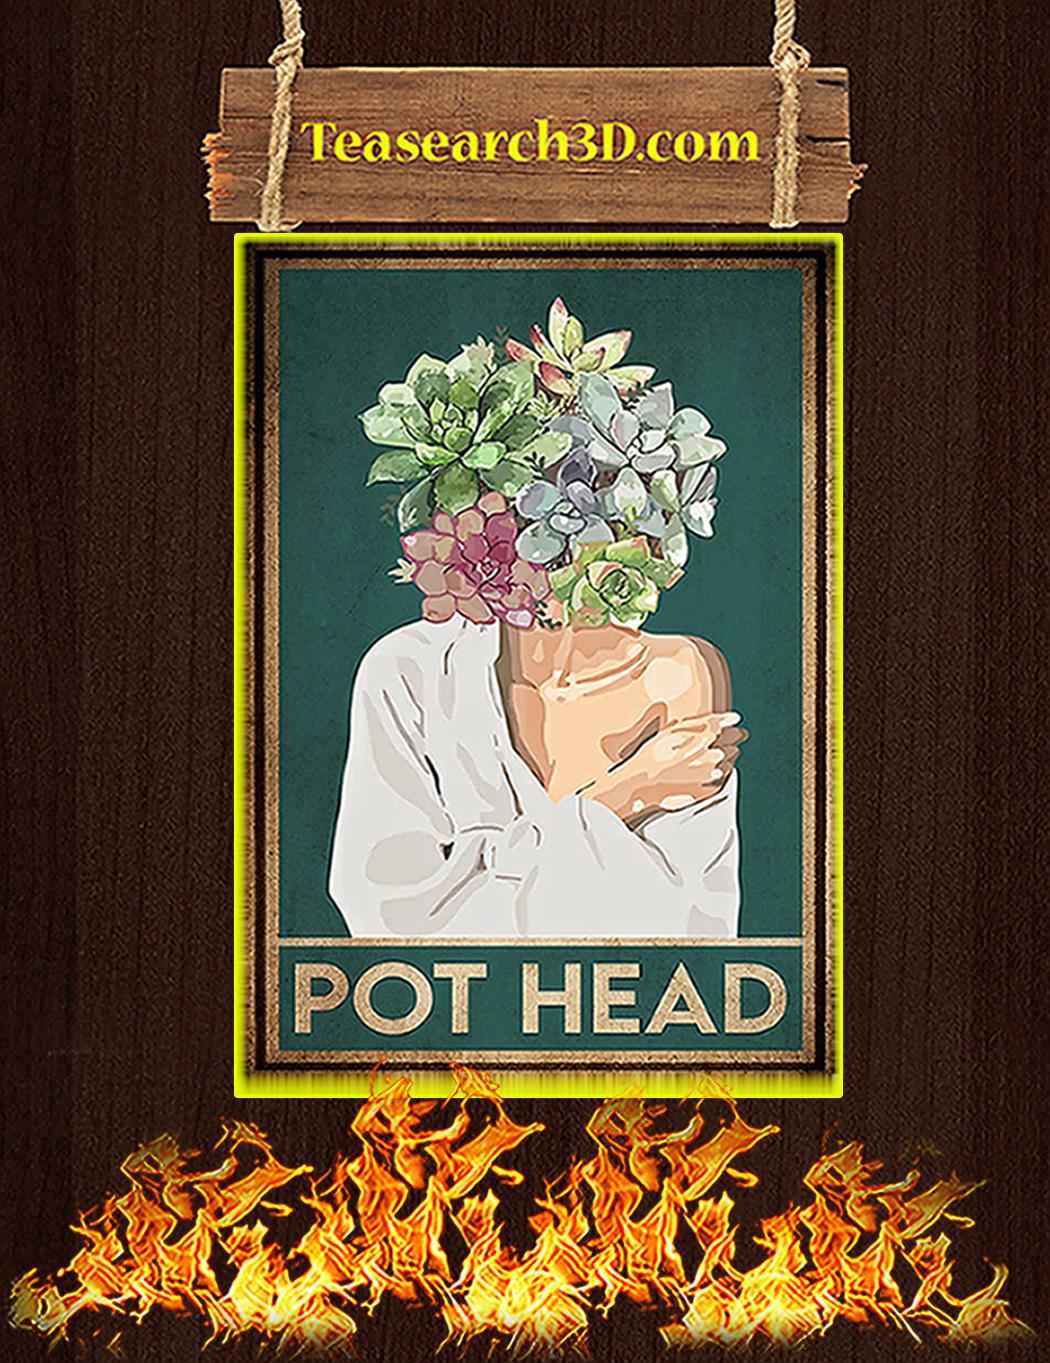 Garden pot head poster A1